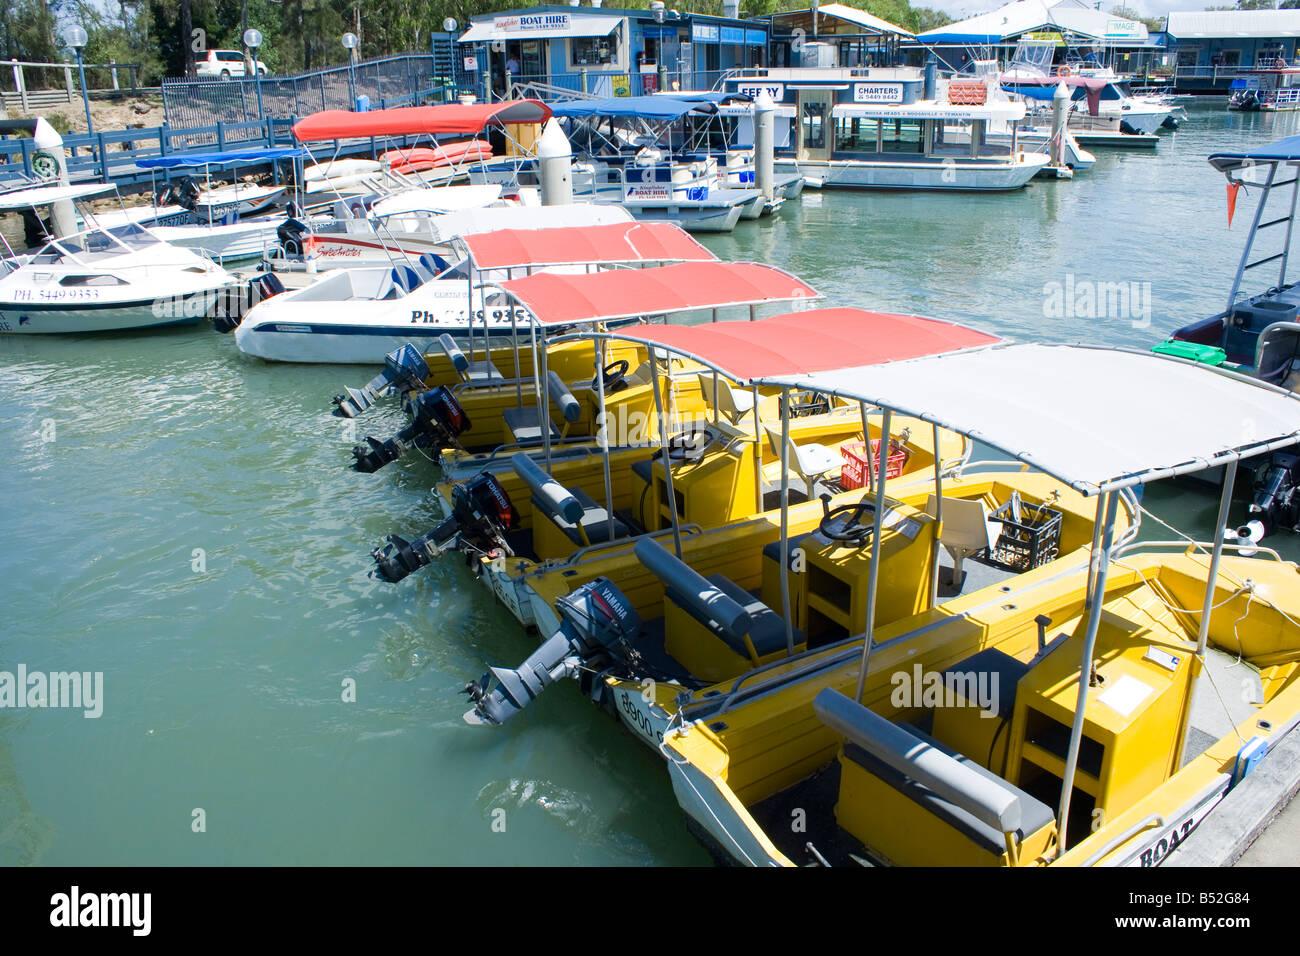 HIre Boats Noosa Marina in Tewantin Qld - Stock Image